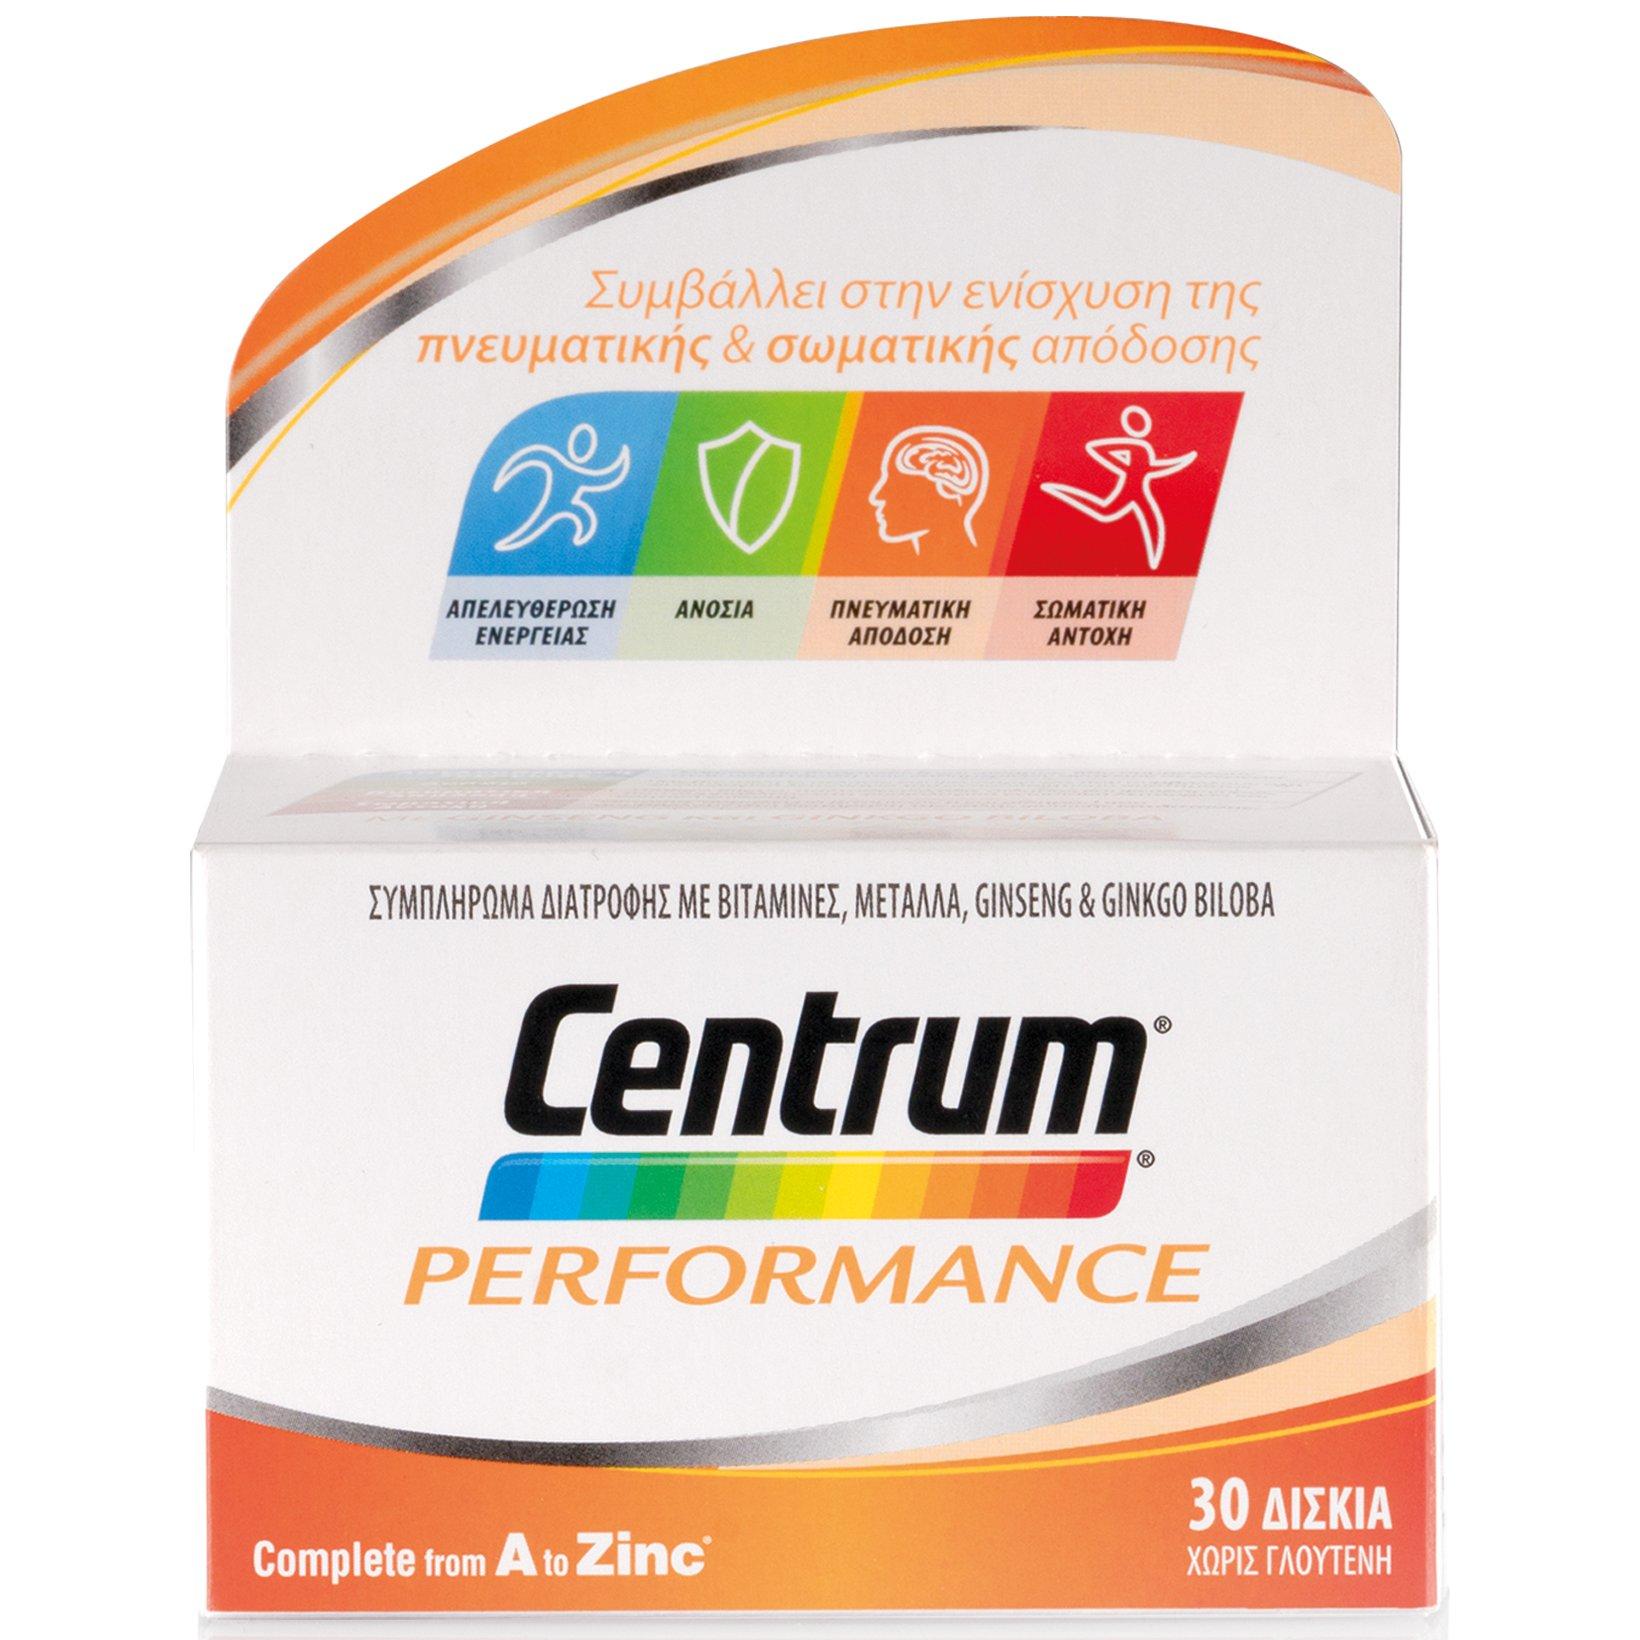 Centrum Performance Πολυβιταμίνη 30tabs